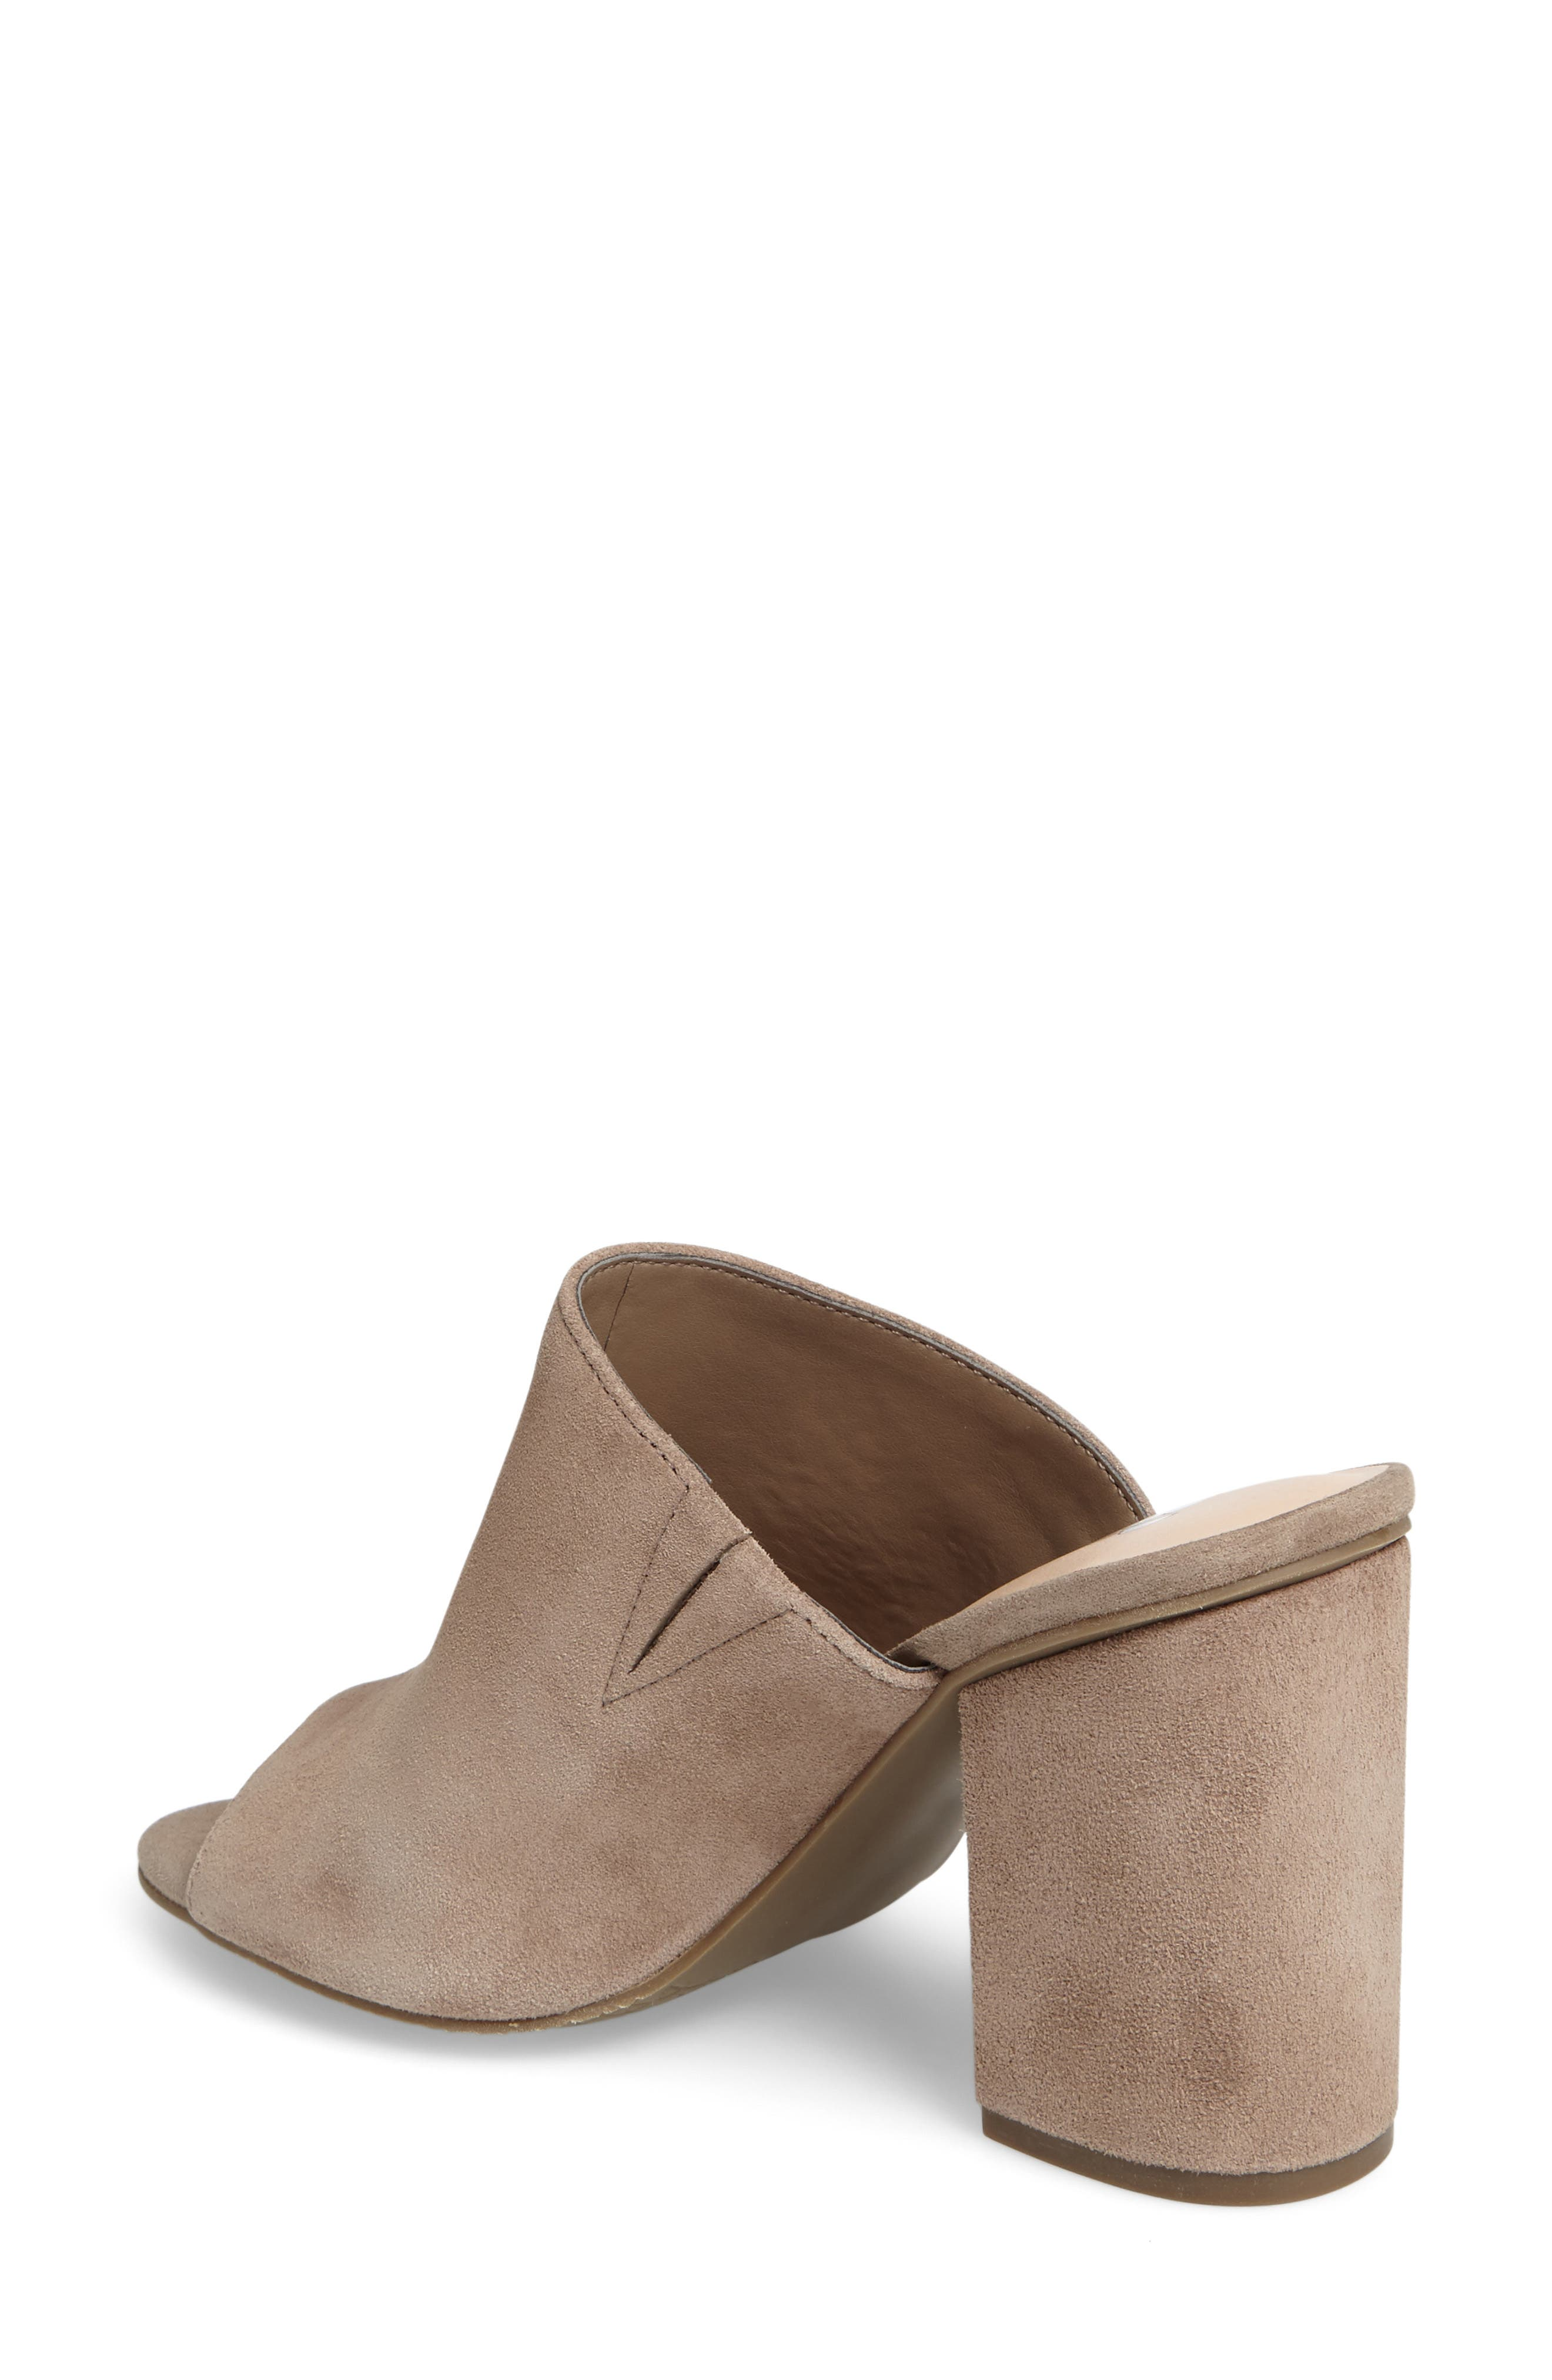 Alternate Image 2  - BP. Tale Block Heel Sandal (Women)